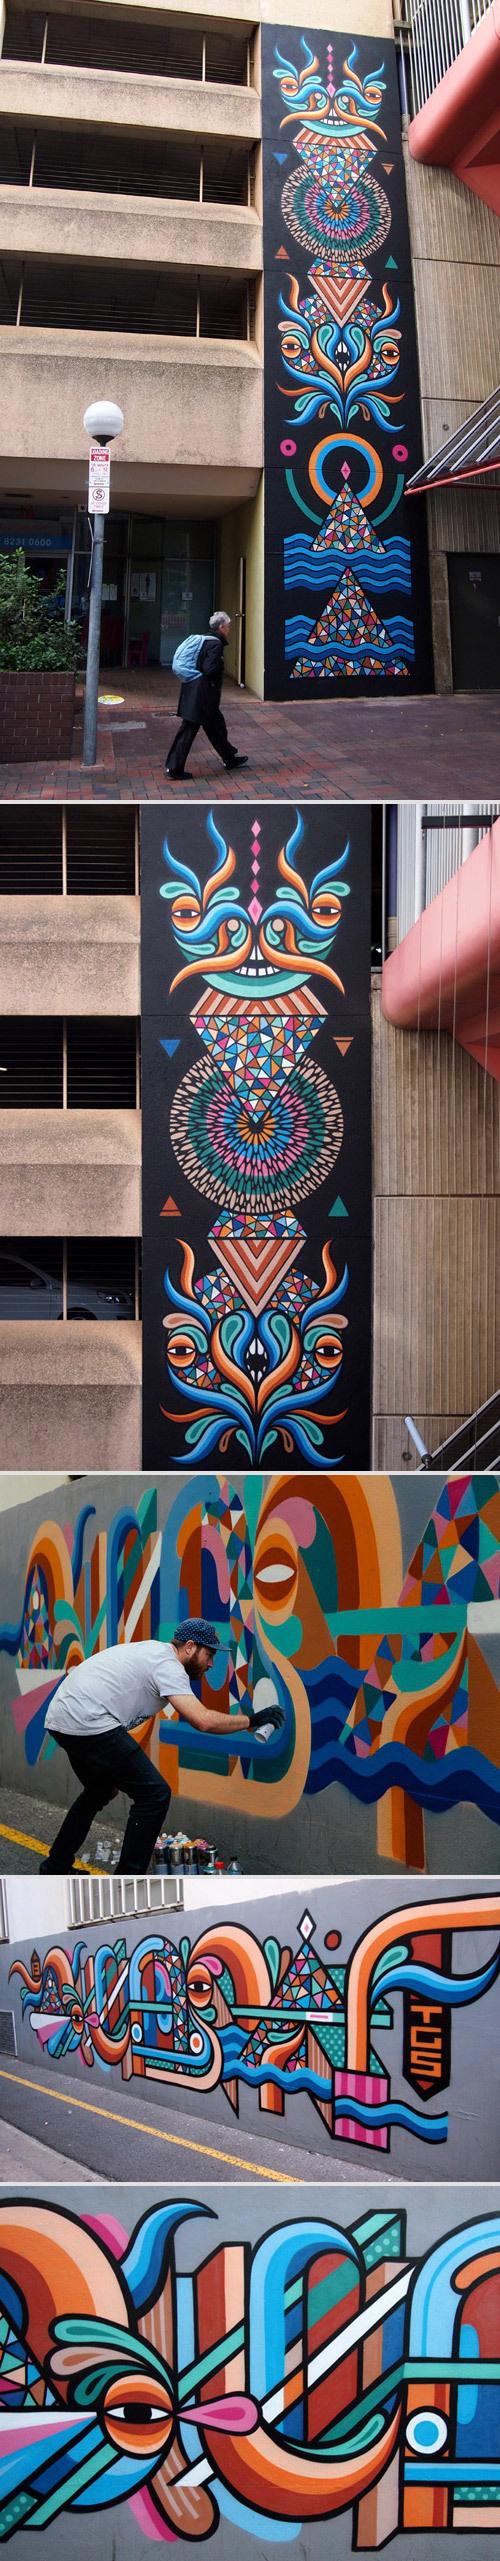 Oi You! #graffiti #painting #street art #wall #colours #beastman